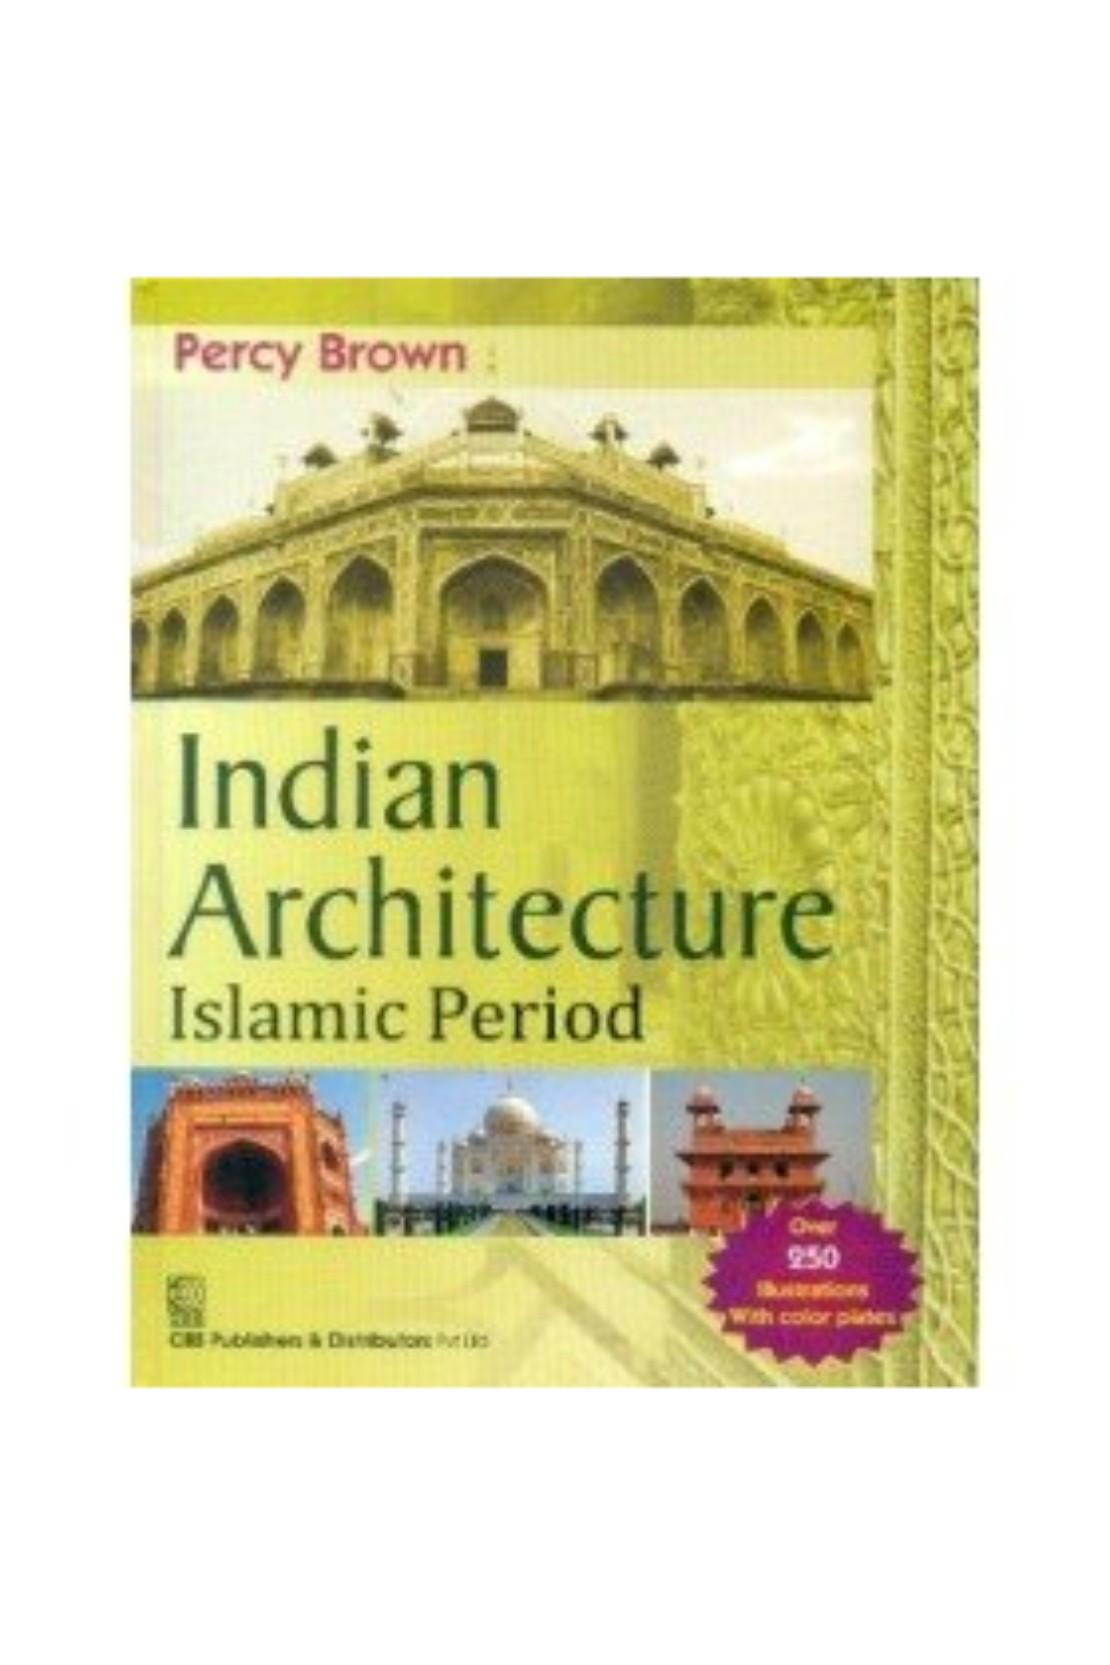 b62a8933dace1 Indian Architecture Islamic Period (HB) BooksInn Shop Pakistan